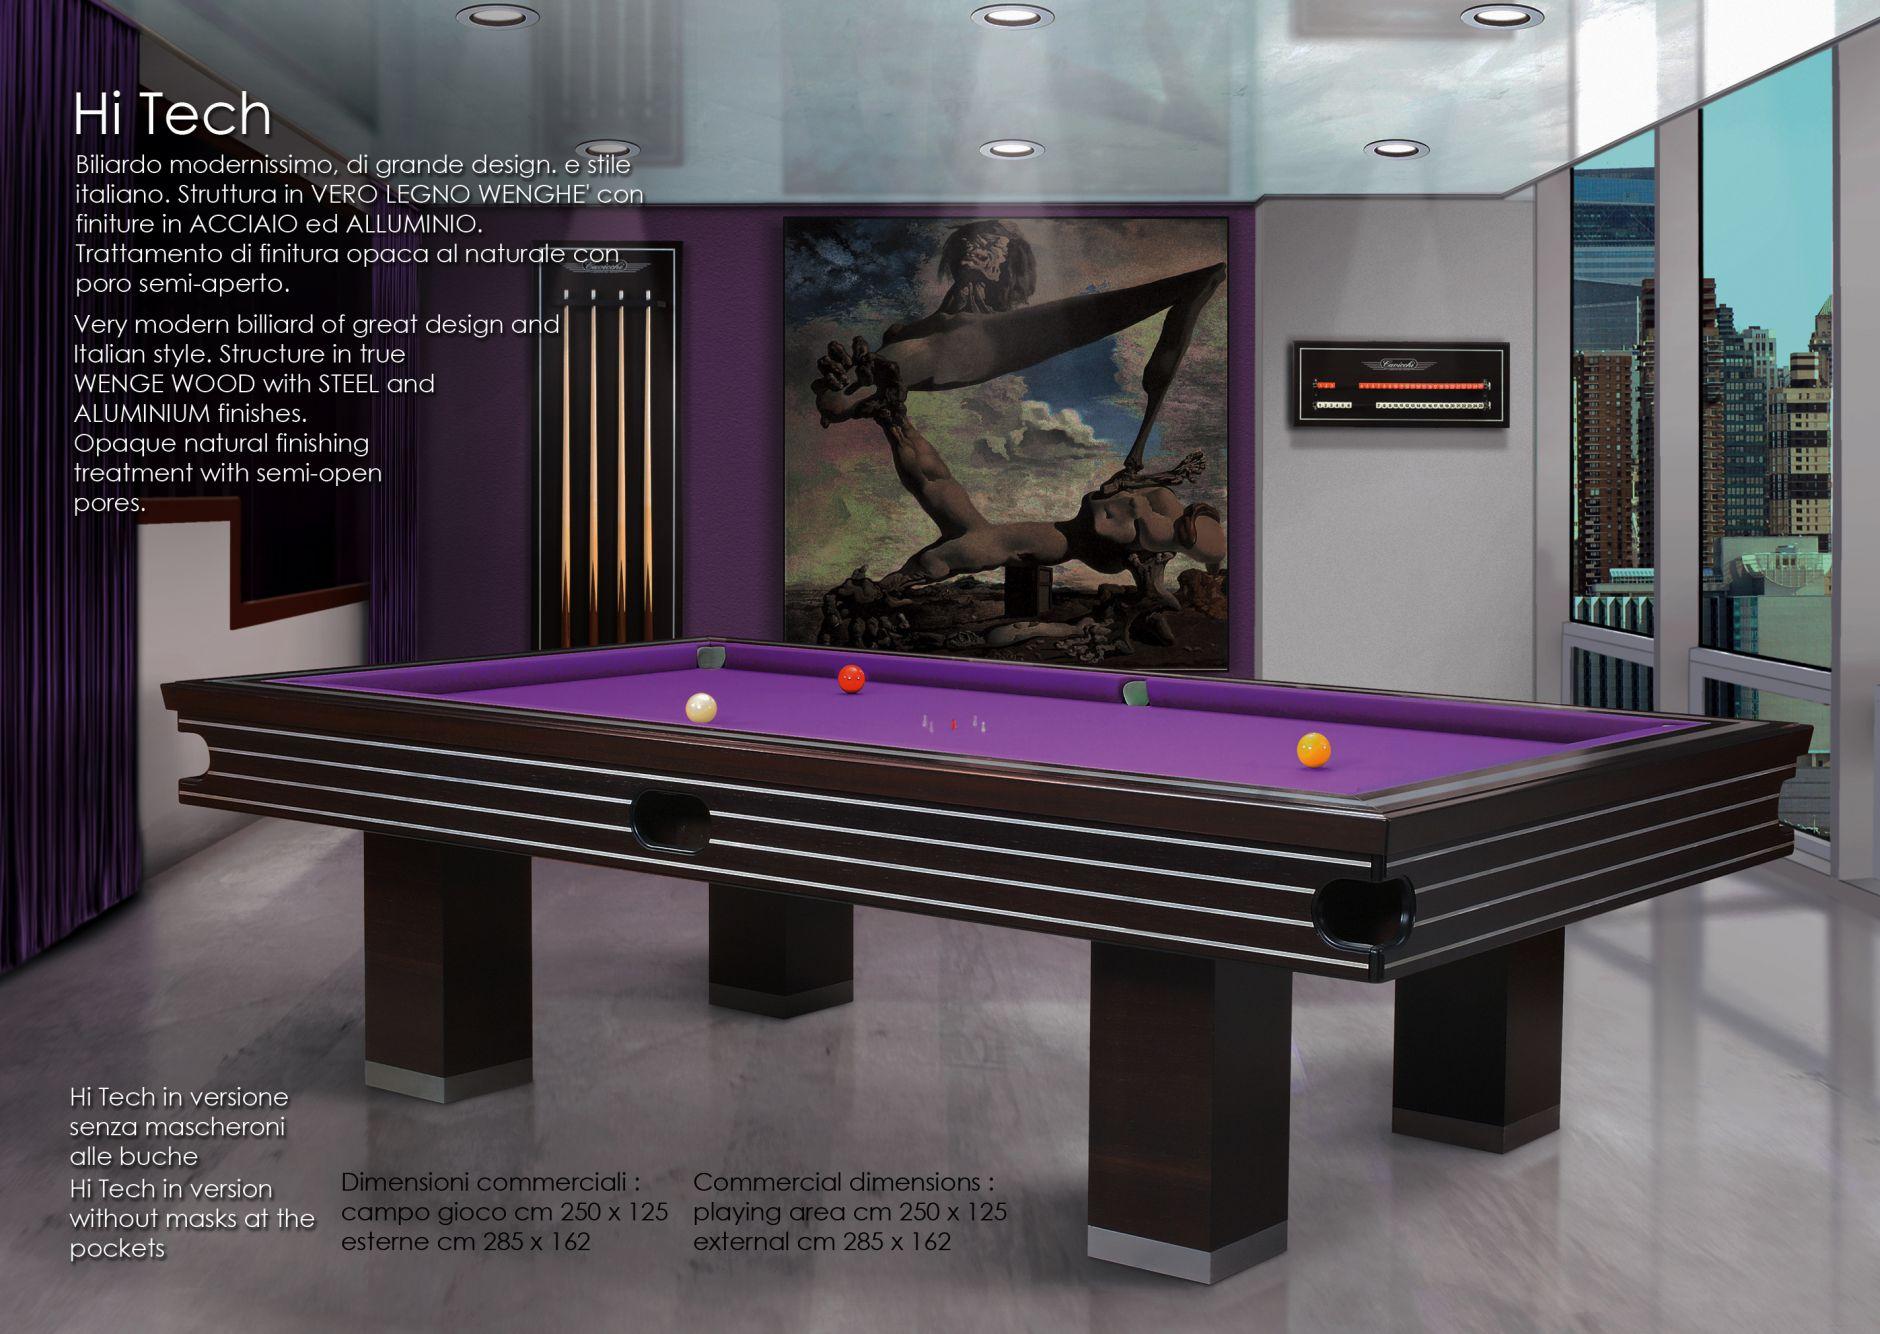 Billiards Tables Billiard Table Hi Tech Seriesfurniture